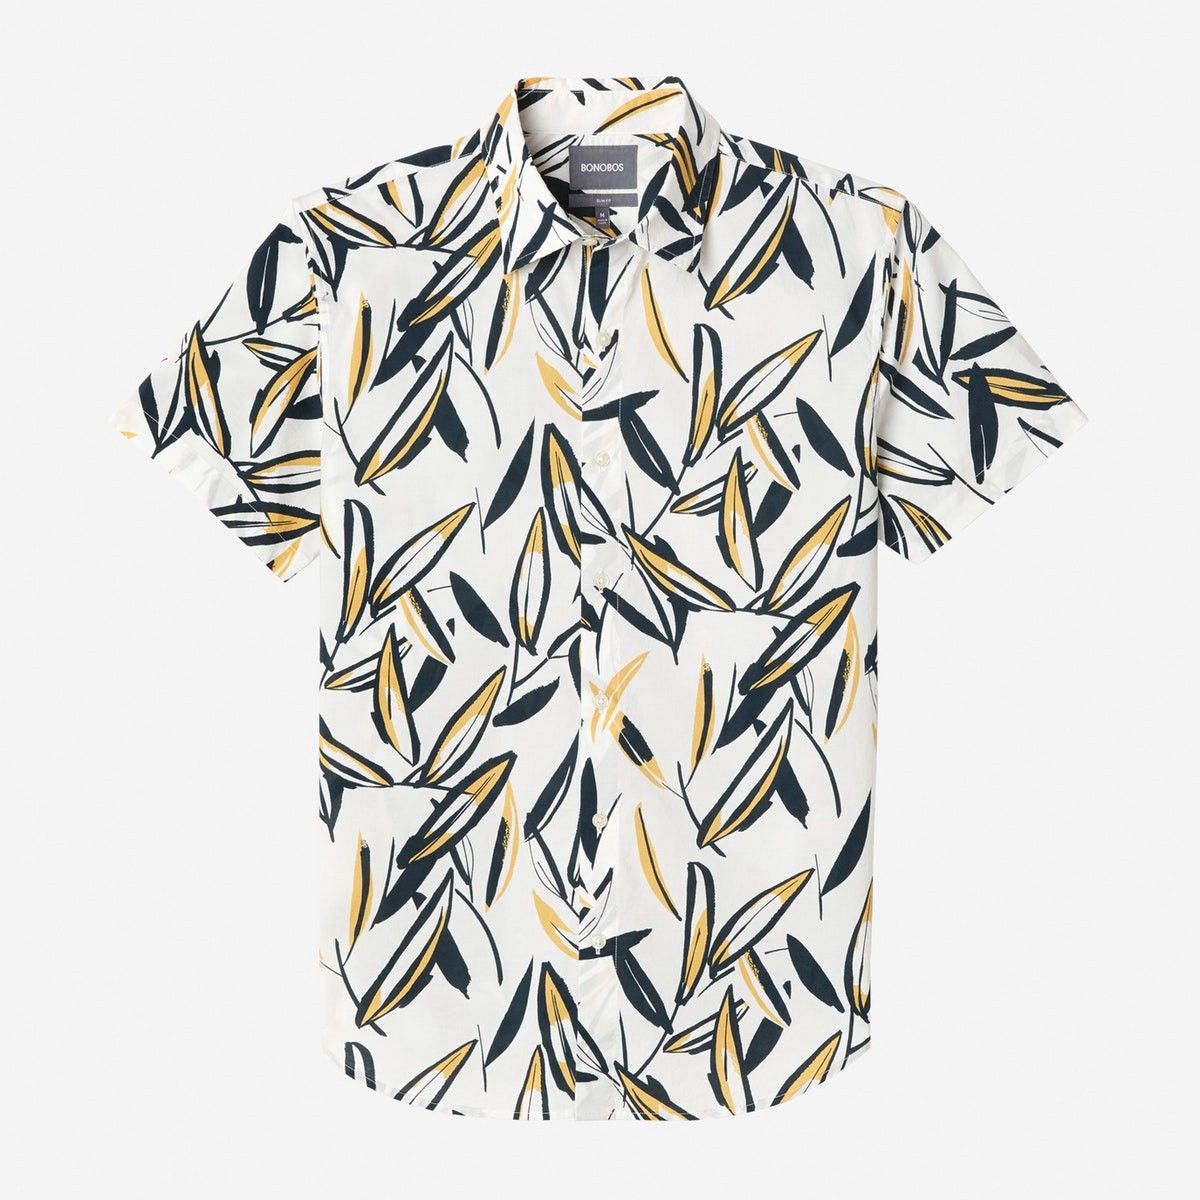 90d31d2bd13 Bonobos Riviera Short Sleeve Shirt (Yellow Leafy Arbor) - Standard Long Xxl